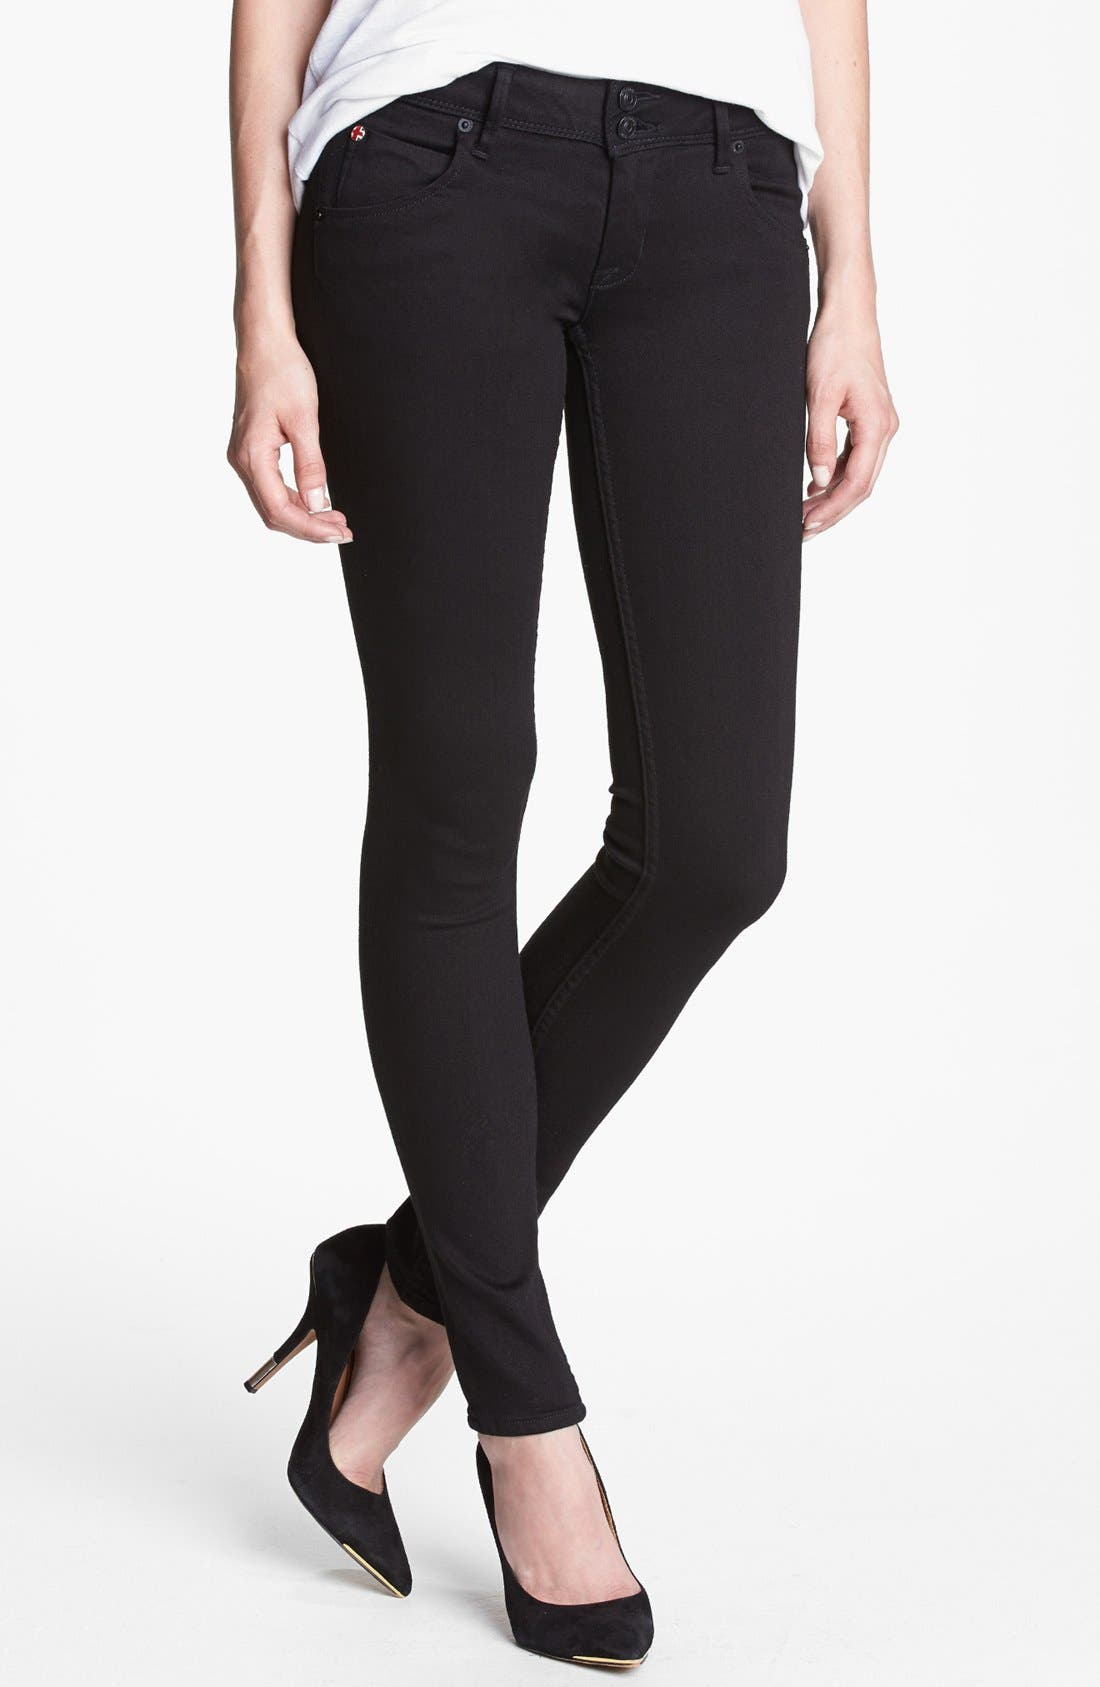 Main Image - Hudson Jeans 'Collin' Skinny Jeans (Black)